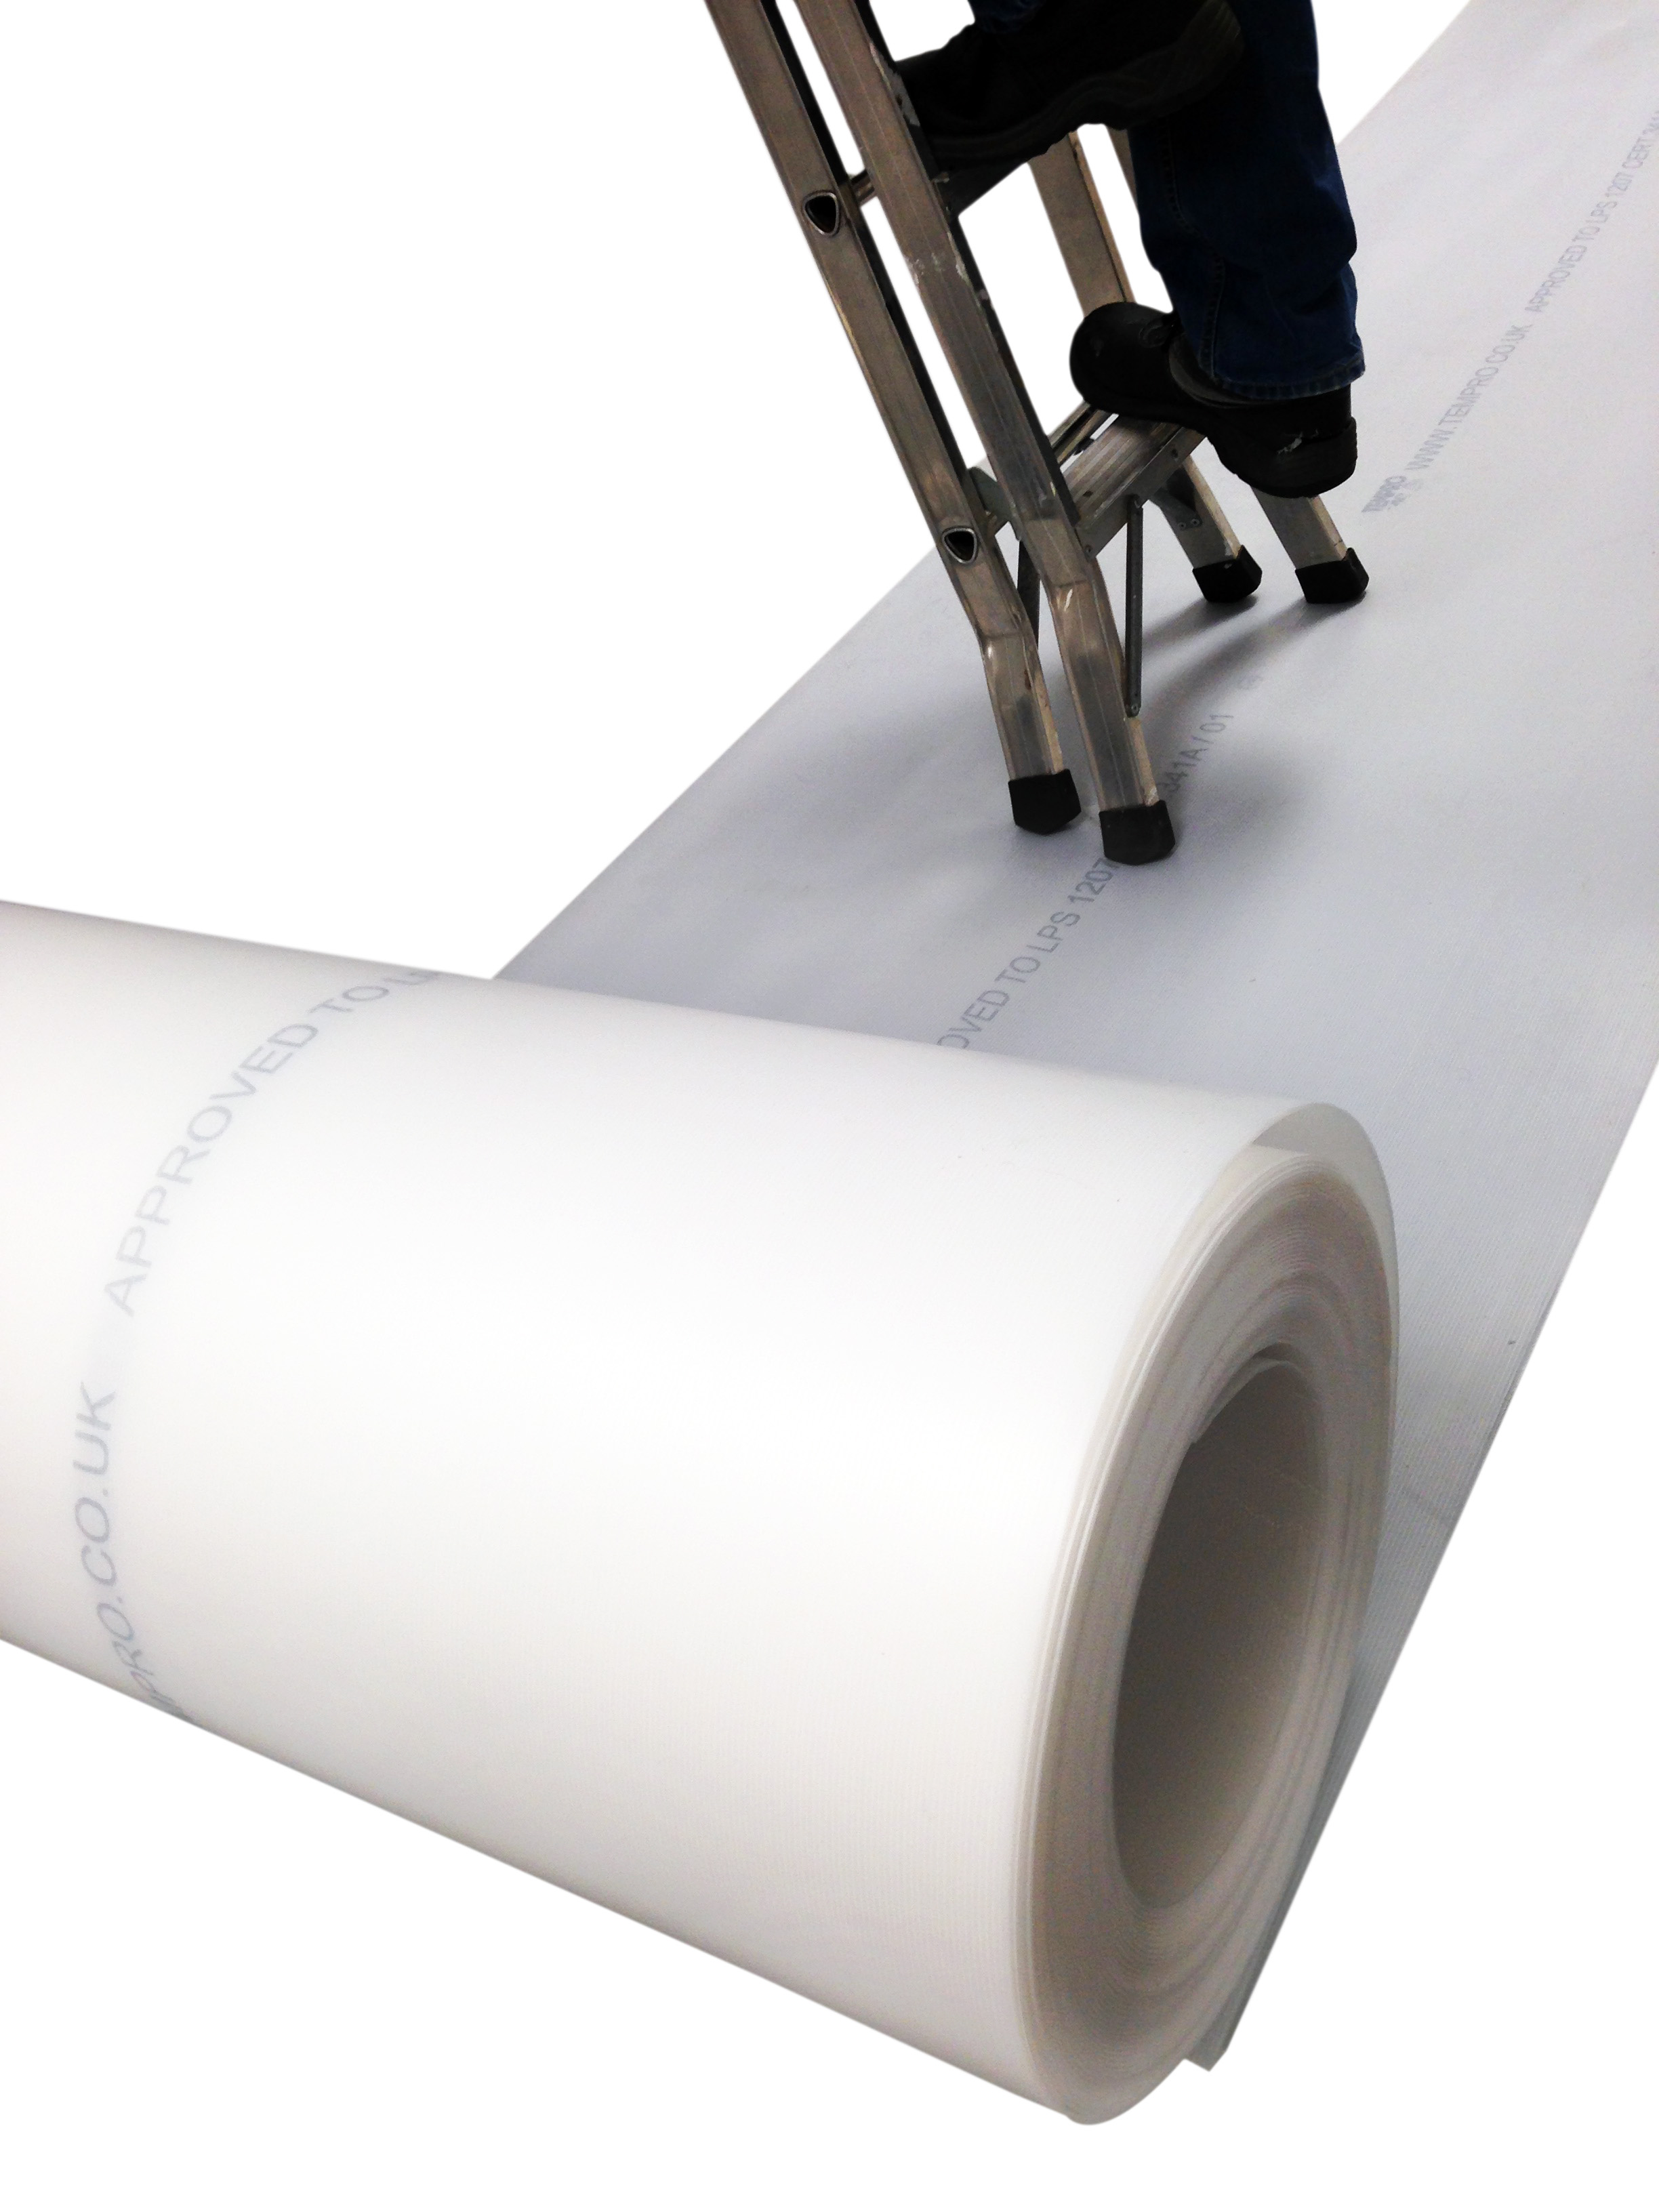 Correx (corex) Corrugated Plastic Roll Floor Protection Fire Retardant (LPS1207) 1M x 50M x 2mm